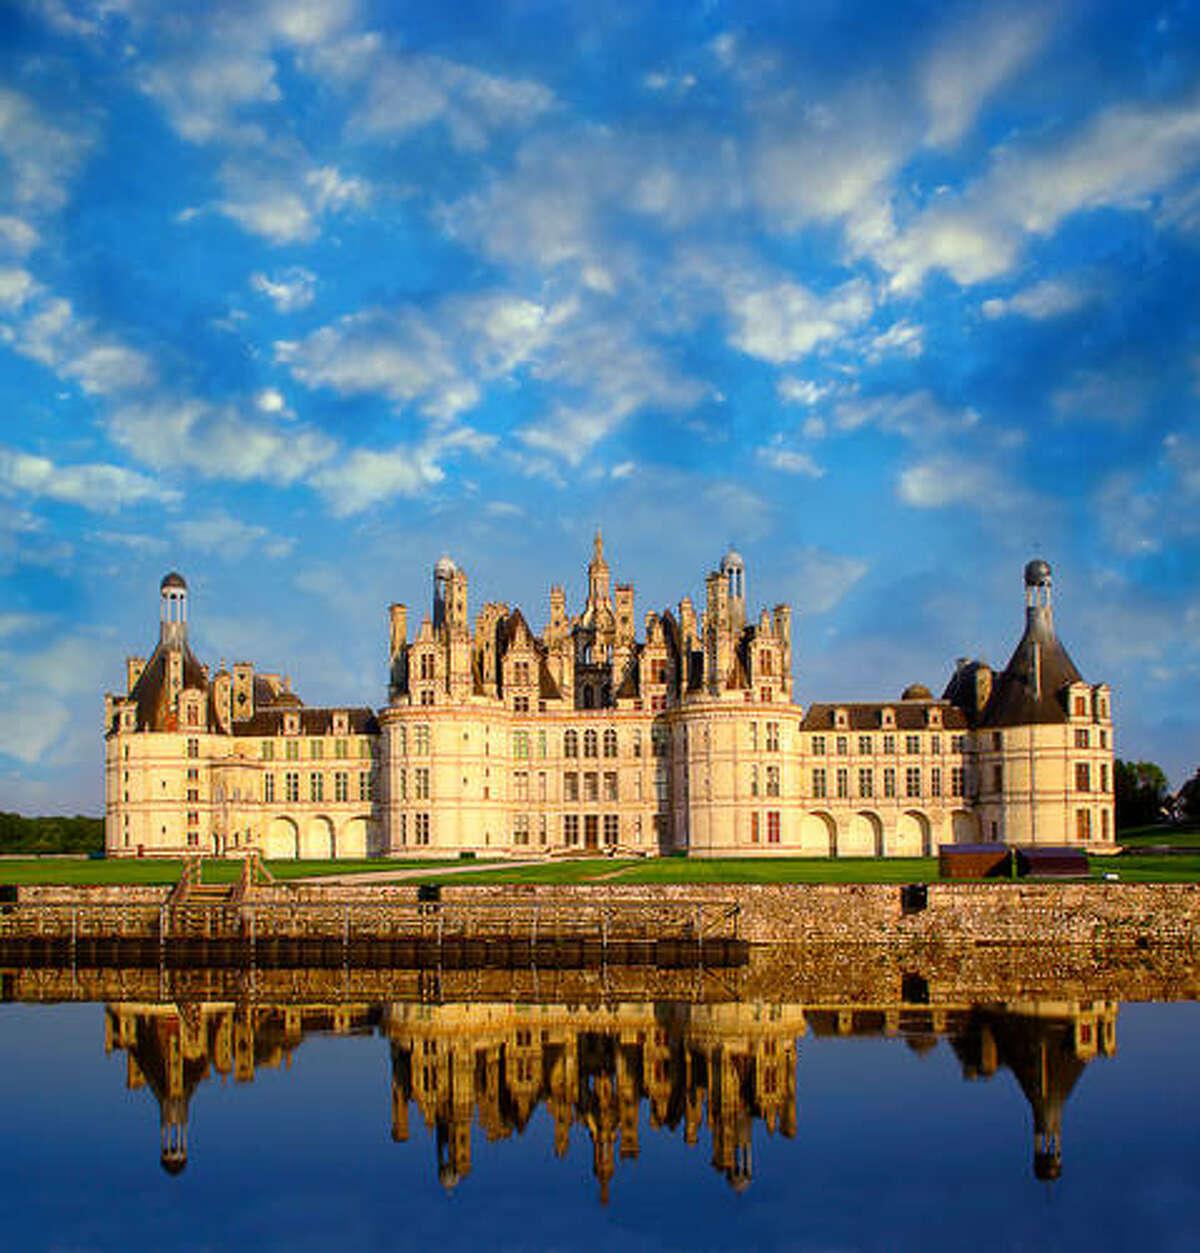 The Ch?teau de Chambord at Chambord. one France's most recognizable castles, is in Loir-et-Cher, France.